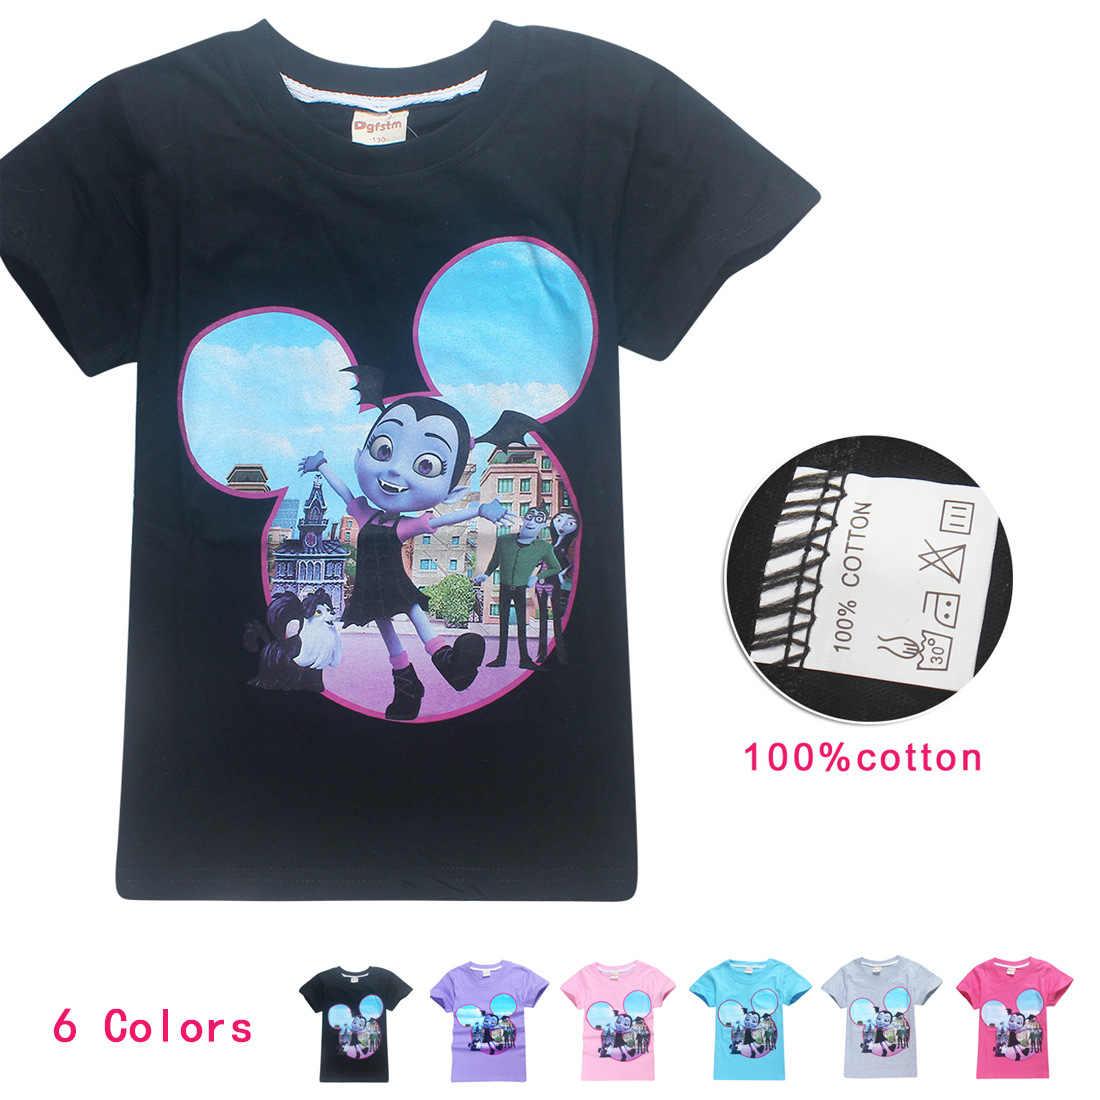 1a3e253f0 2018 summer Vampirina girls T-shirt boys and girls Bobo Choses cartoon  moana trolls cute